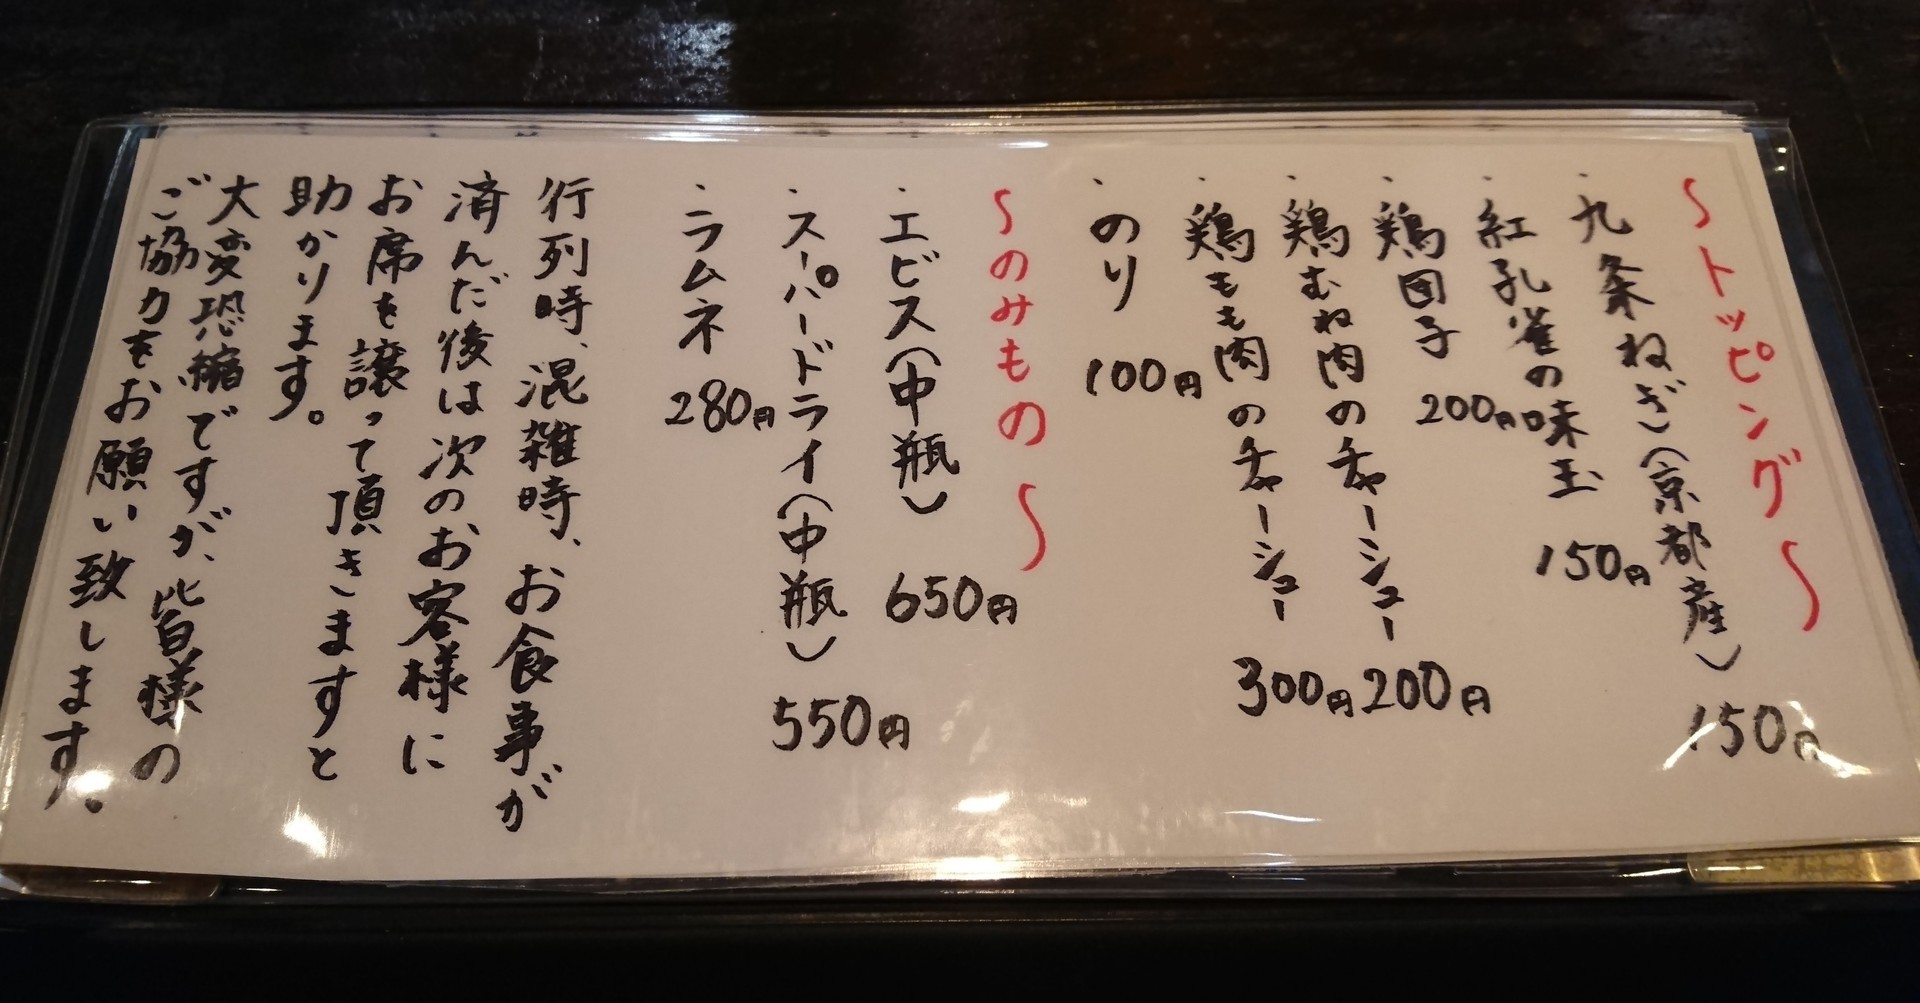 DSC_3153.JPG